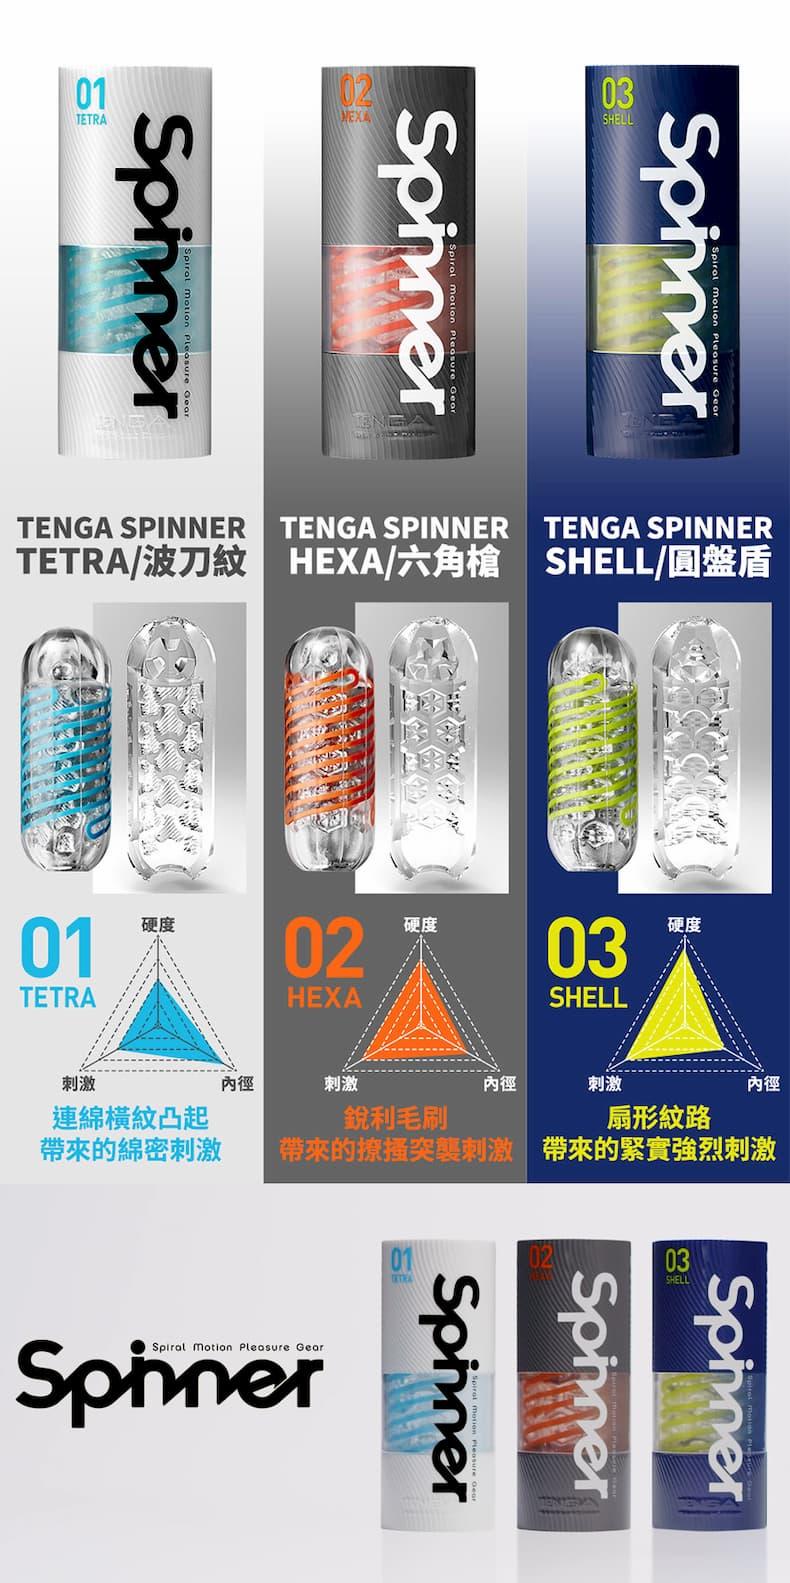 TENGA-SPINNER系列 HEXA 六角槍02 產品展示